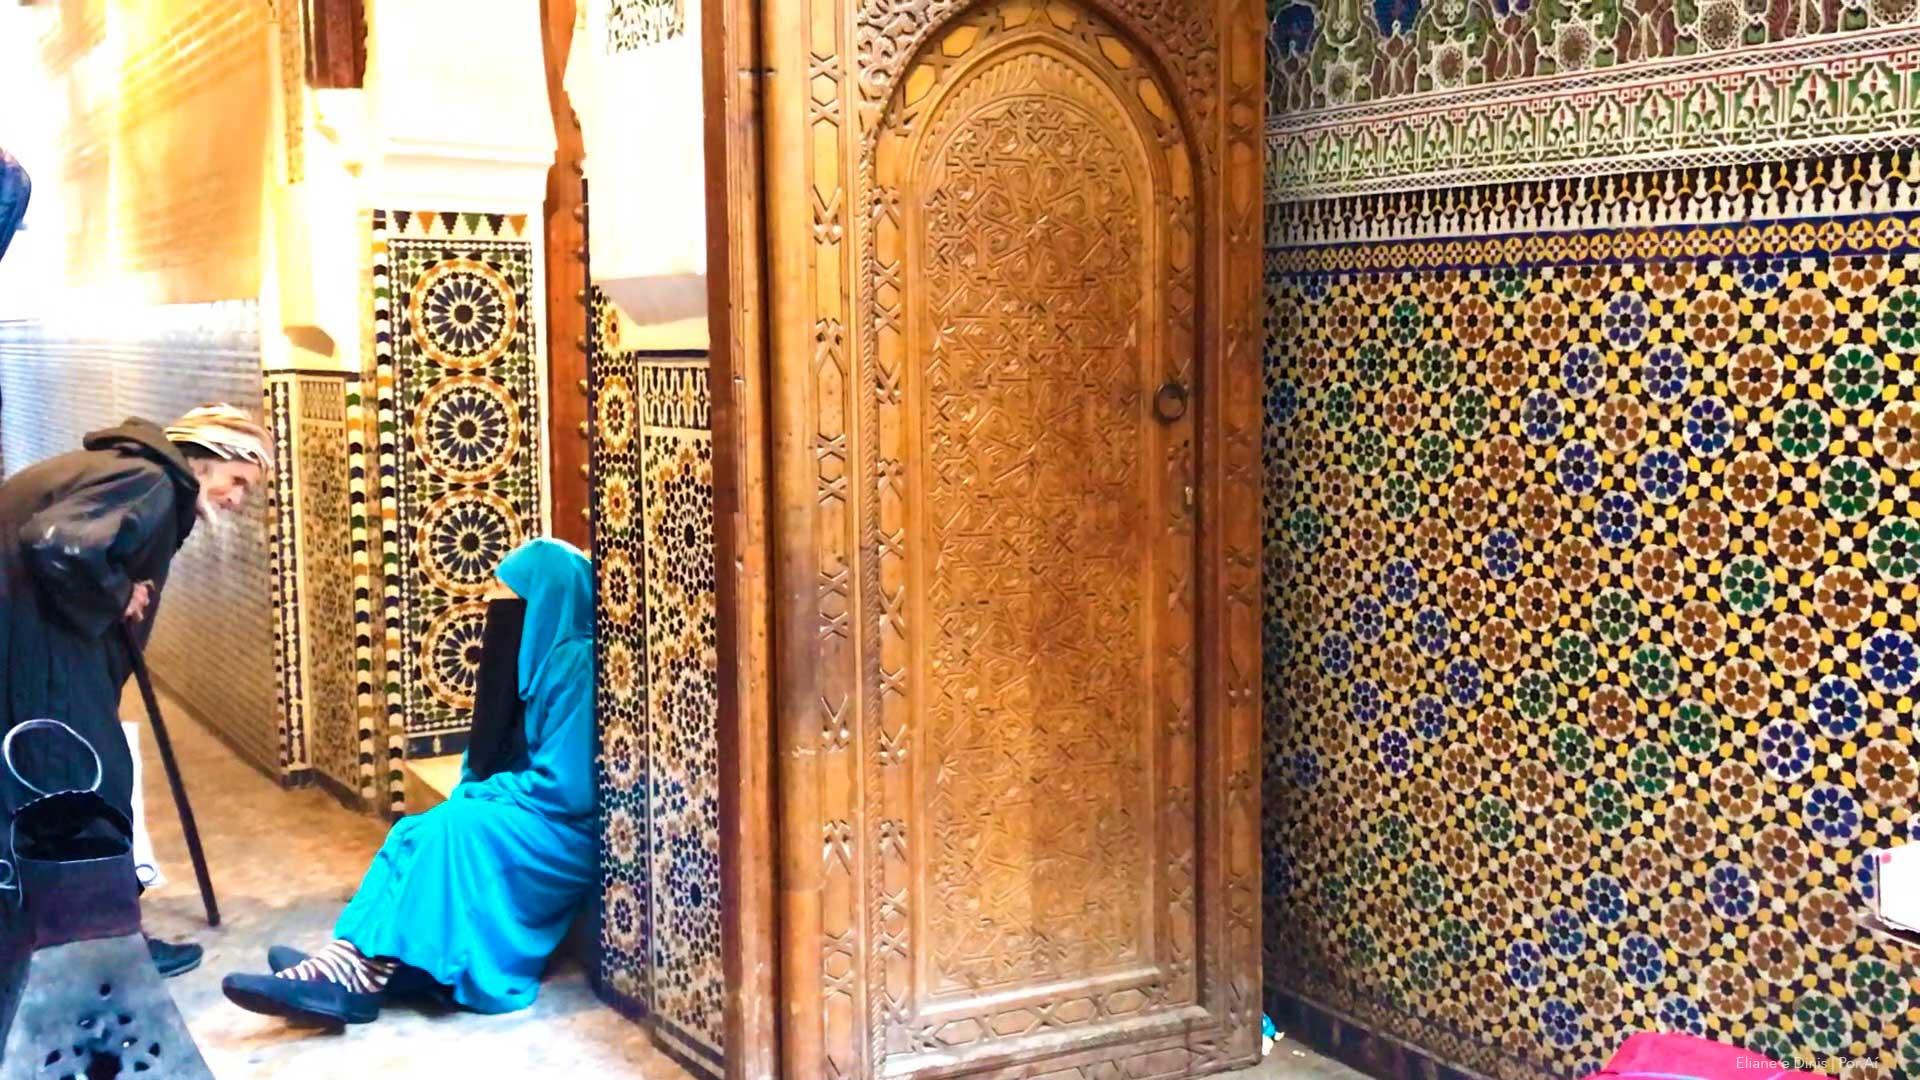 Cenas-em-Fés,-Marrocos